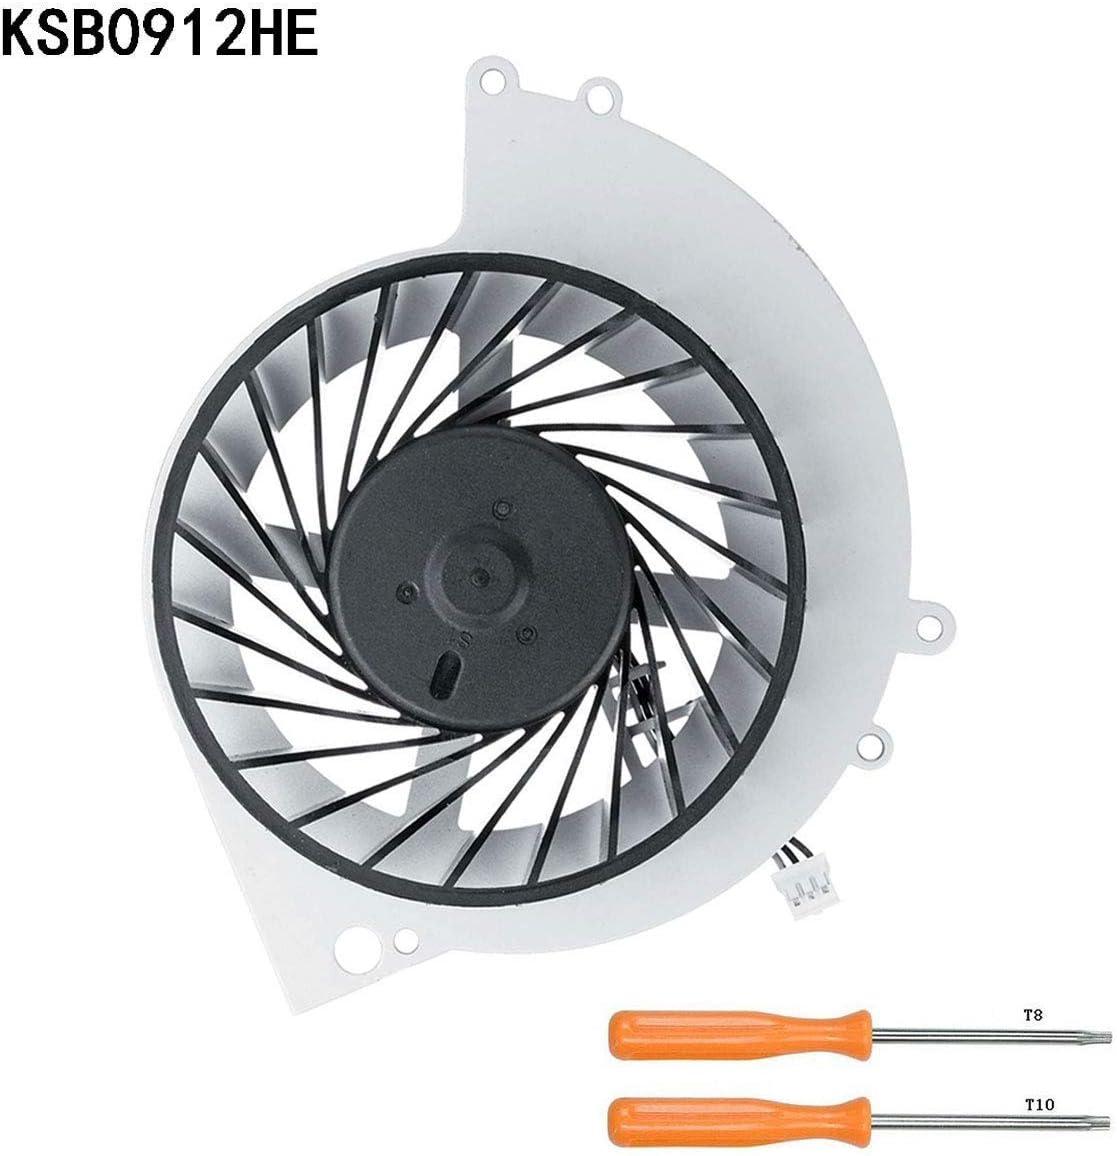 Poweka KSB0912HE CPU GPU Ventilador Interno de Enfriamiento de ...